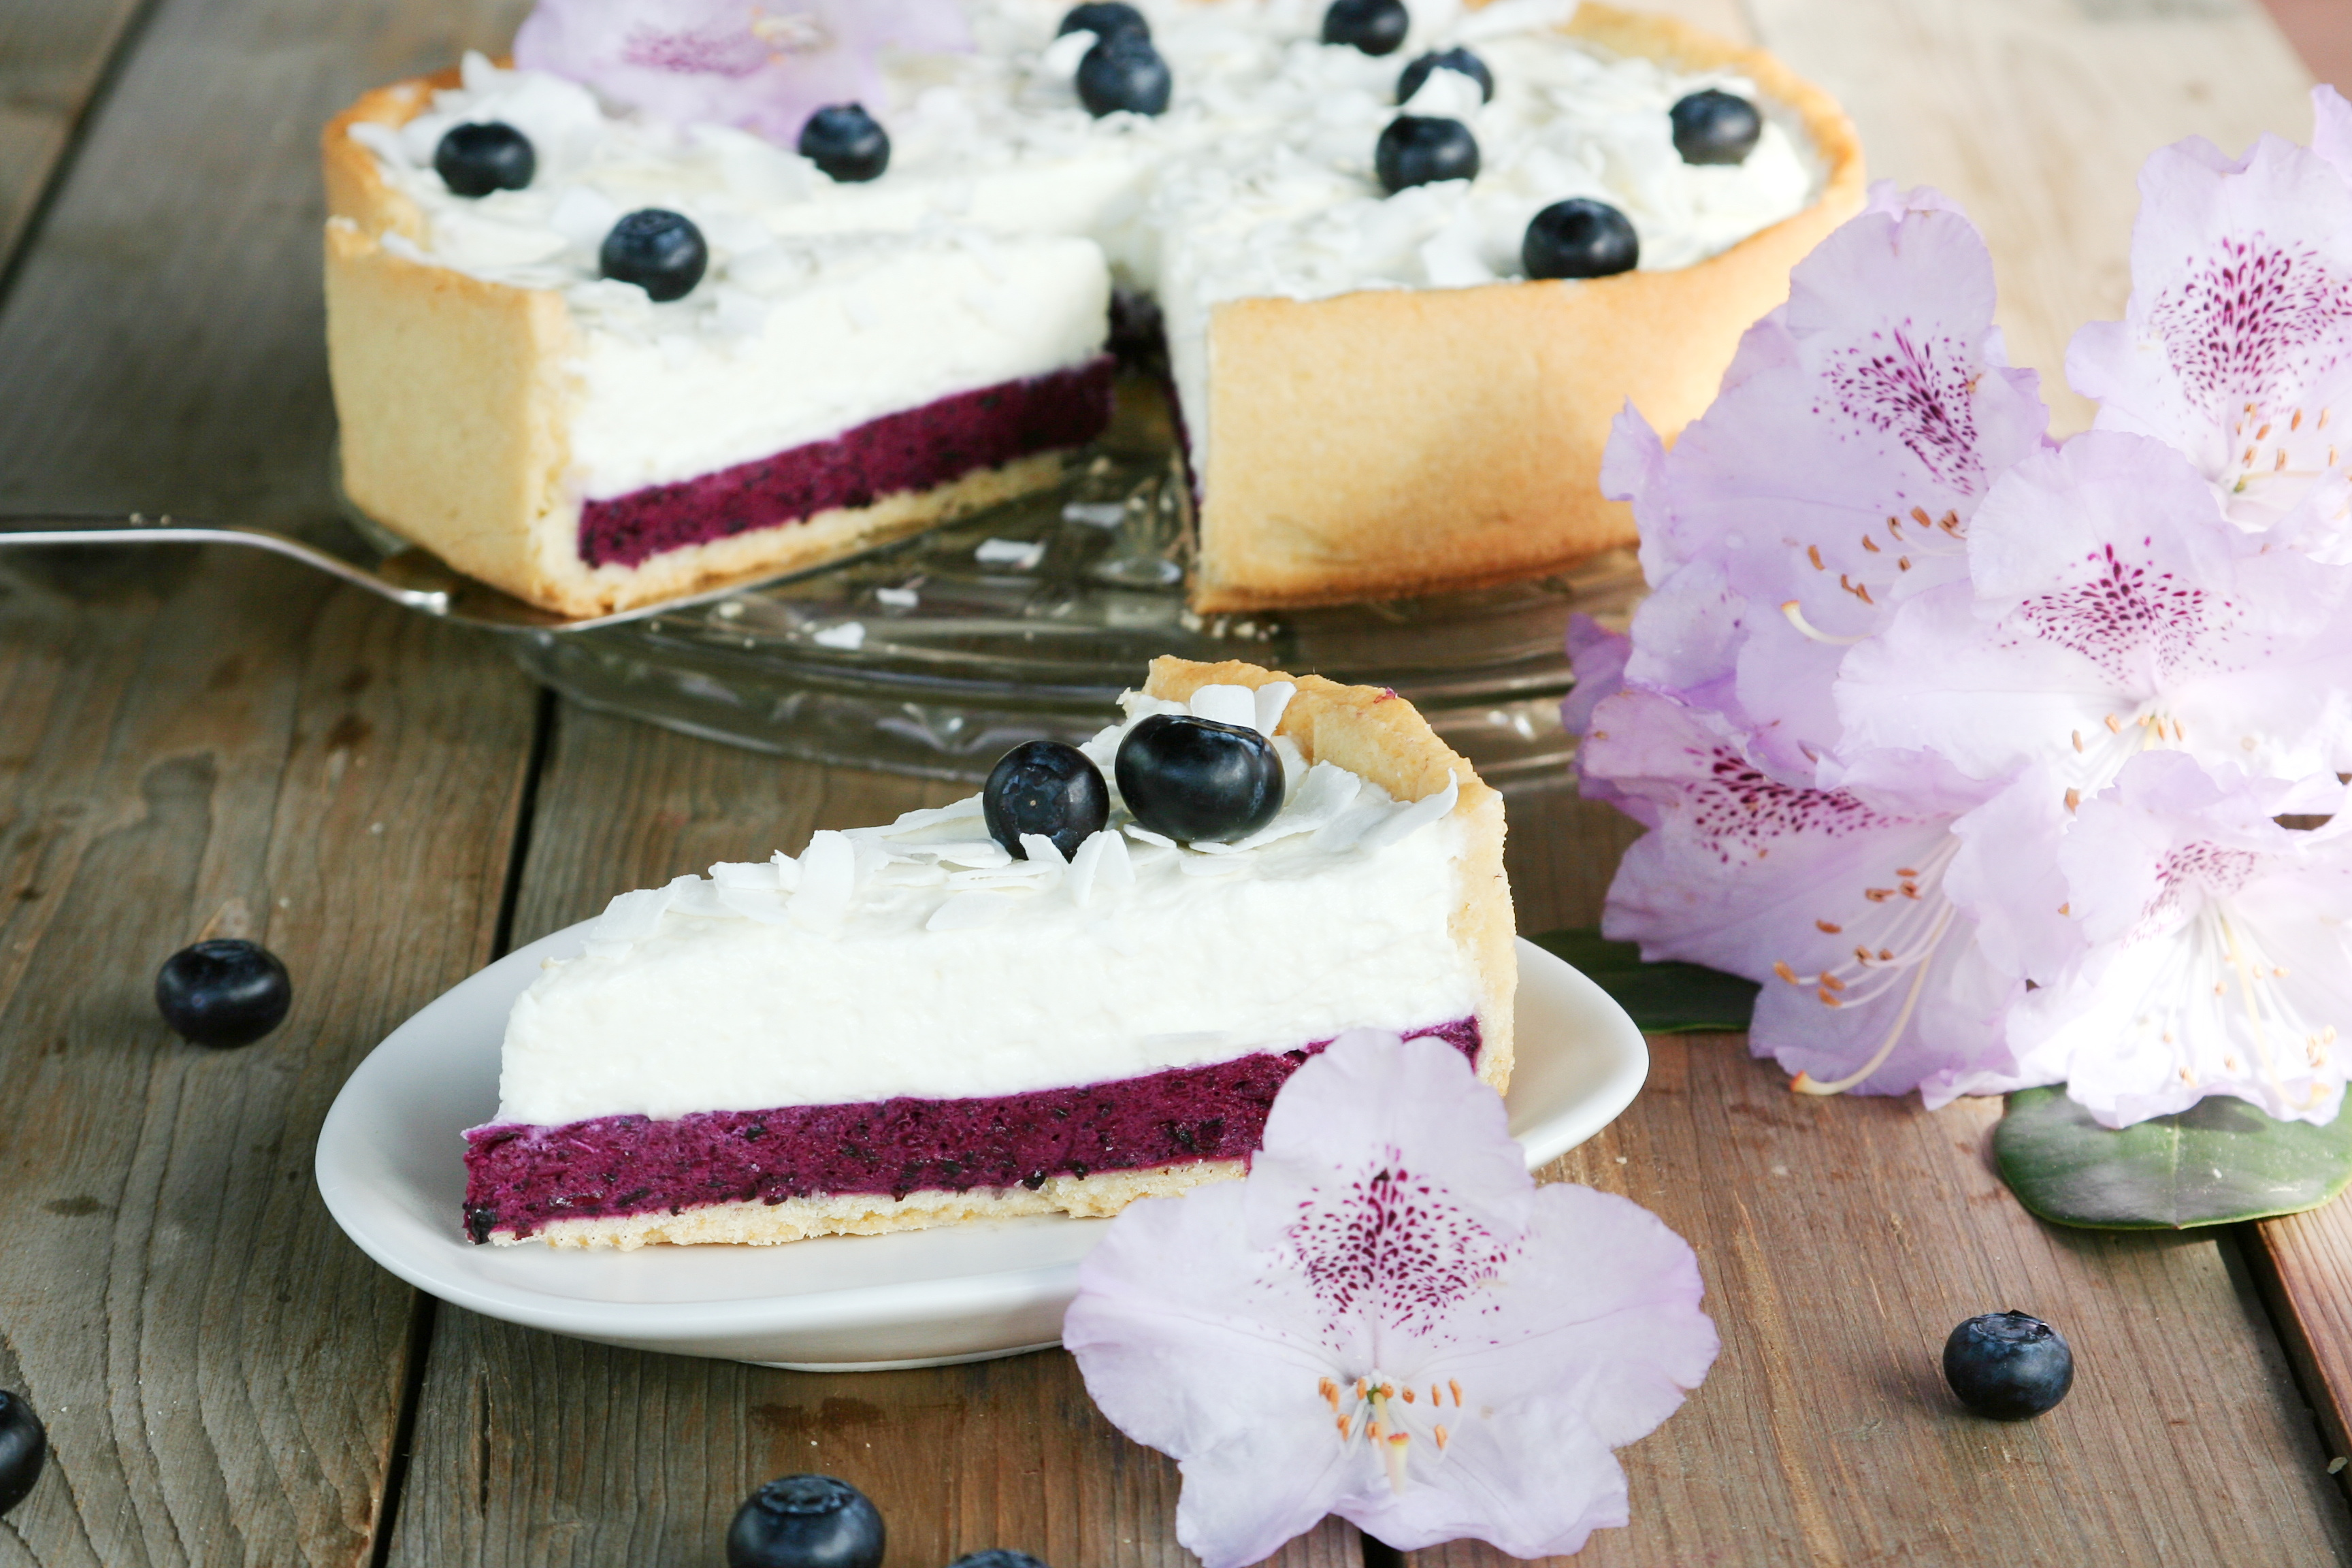 Borůvkový koláč se smetanovým krémem